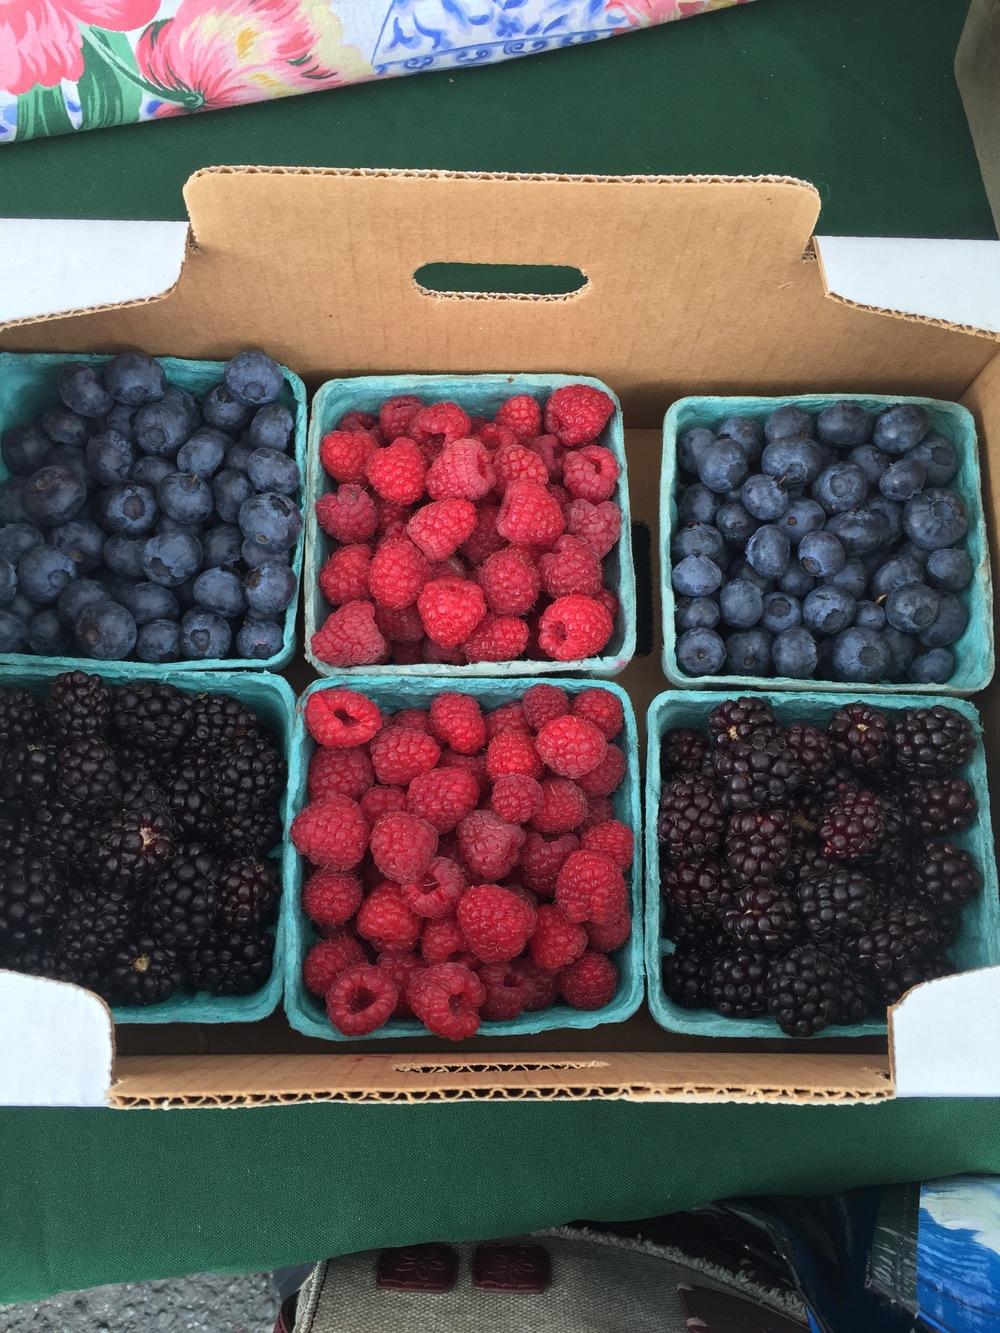 Boysenberries, blueberries, raspberries from  Port Townsend, Washington Farmers' Market .